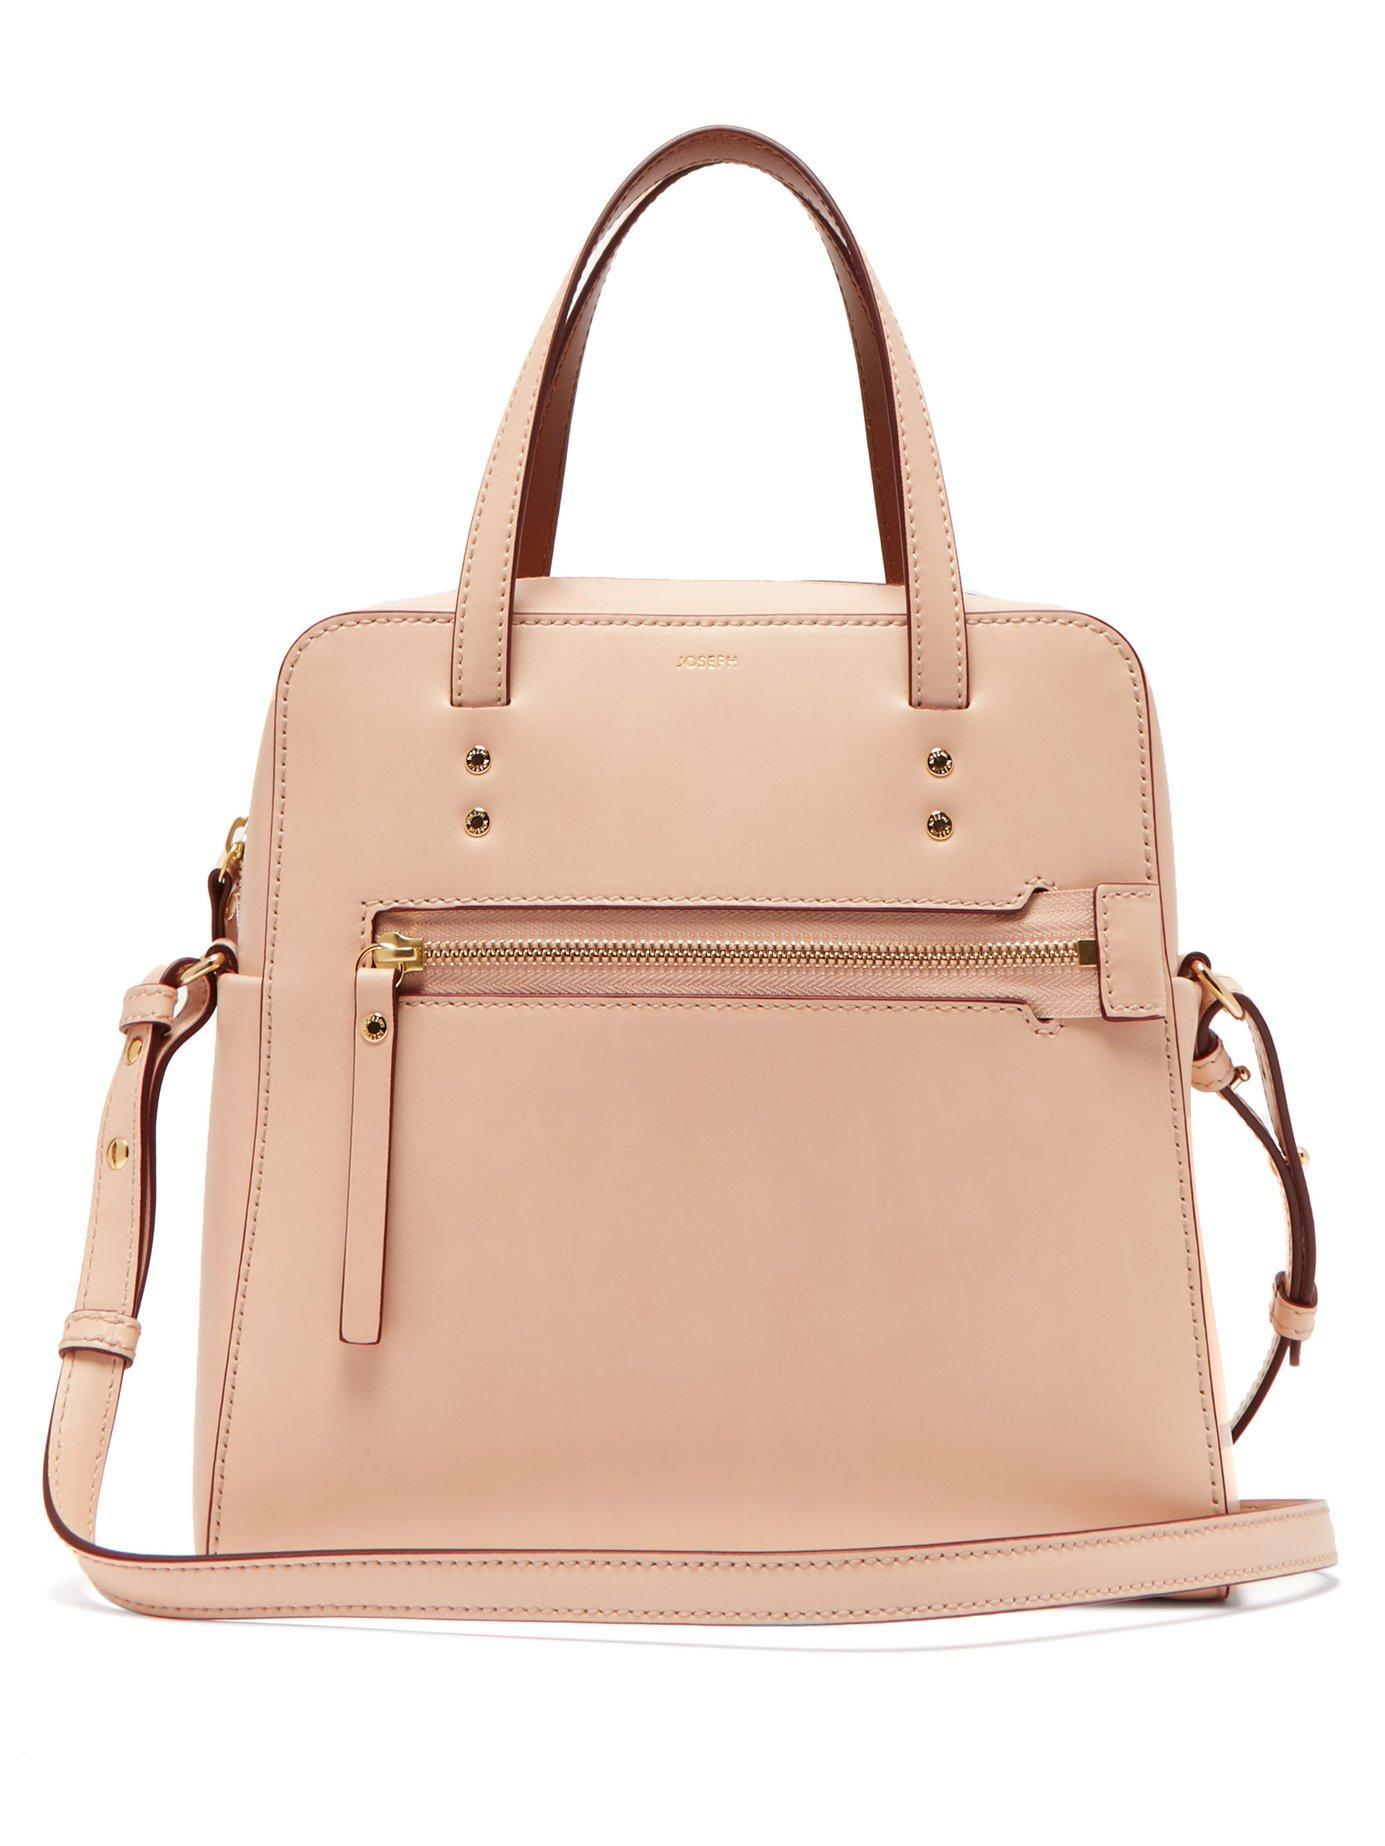 Joseph - Pink Ryder Leather Cross Body Bag - Lyst. View fullscreen 970c3ce234cf4